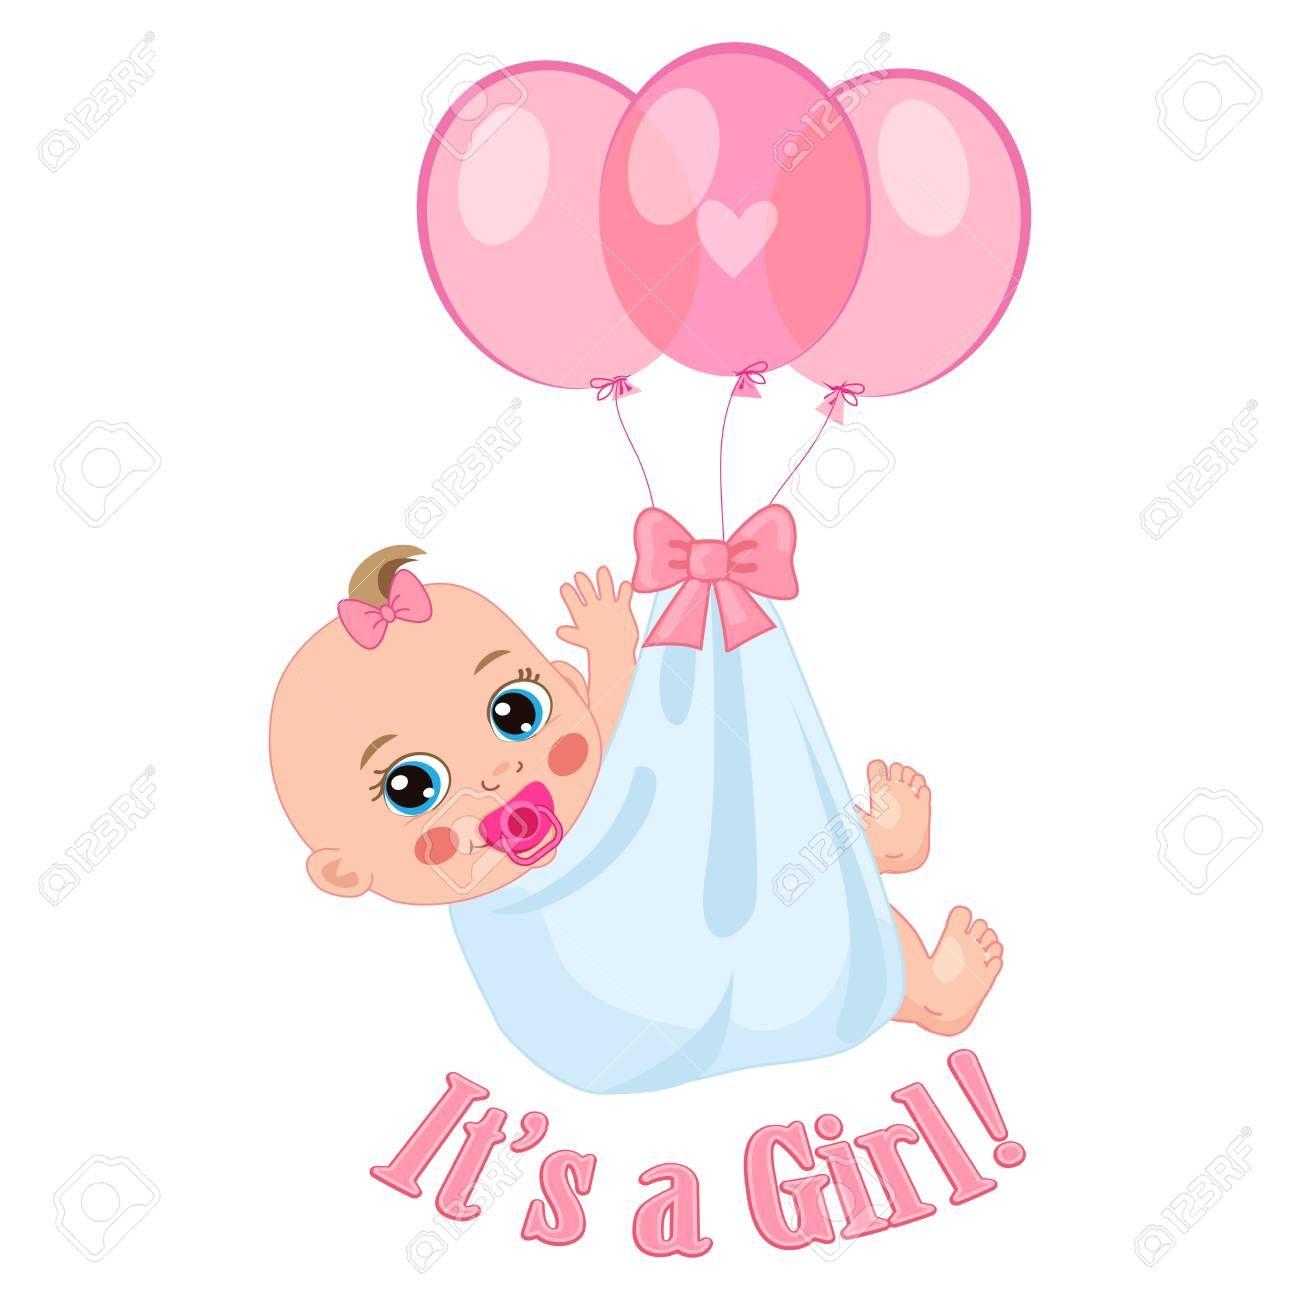 Imagini Pentru It S A Girl Baby Girl Shower Cards Kids Invitation Card Baby Girl Cartoon Images